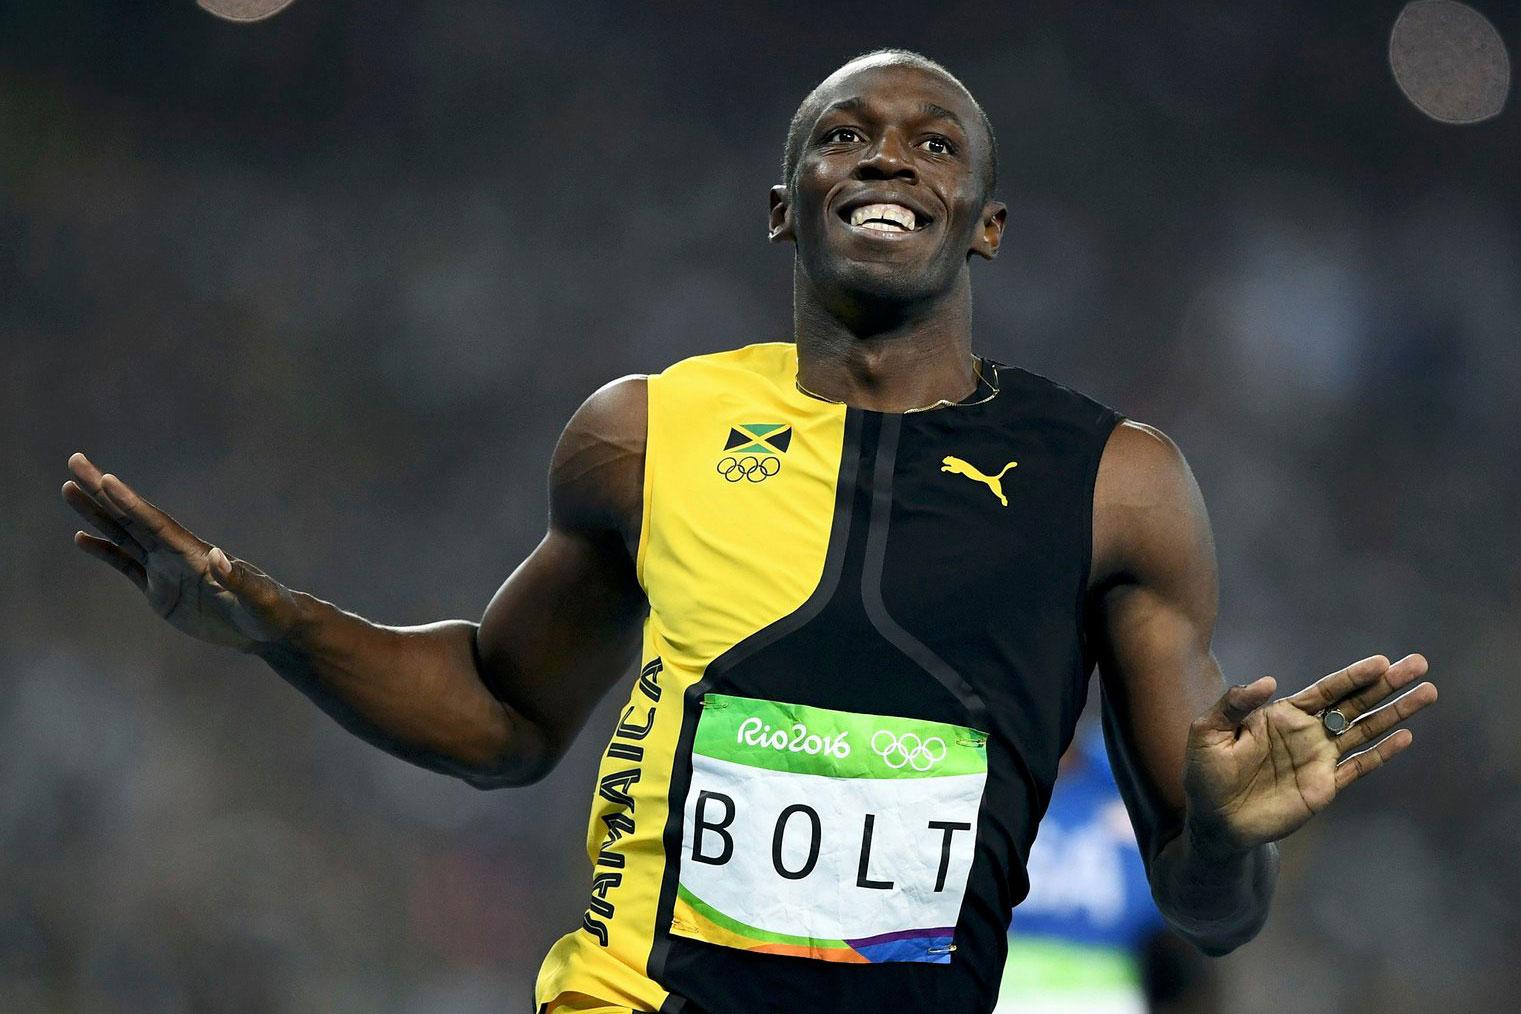 Usain Bolt Wins 100m Final, Winning the Olympic Gold for an Unprecedented Third Time